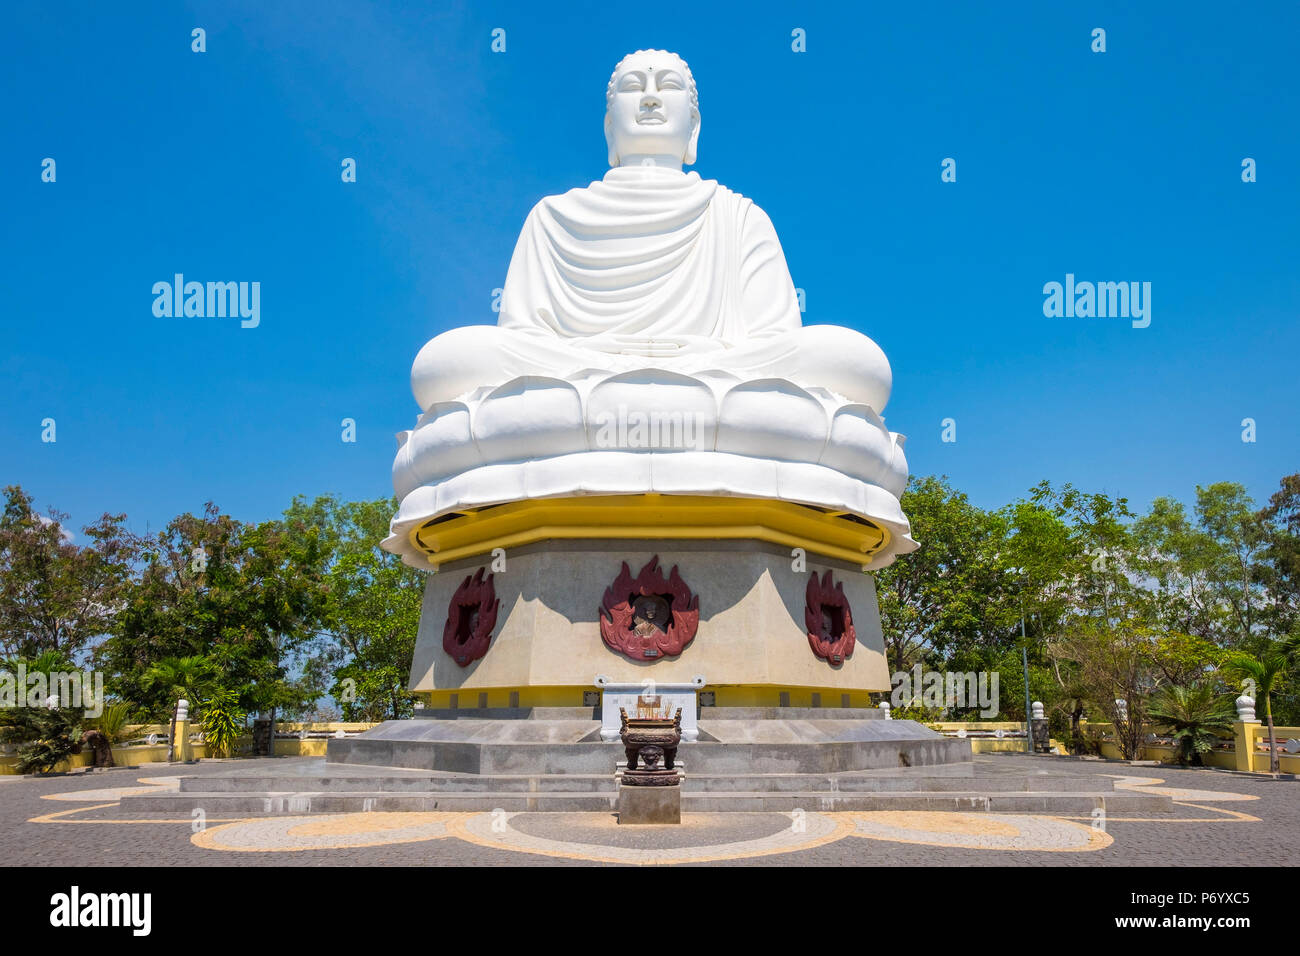 Giant Buddha at Long Son Pagoda (Chua Long Son) Buddhist temple, Nha Trang, Khanh Hoa Province, Vietnam - Stock Image